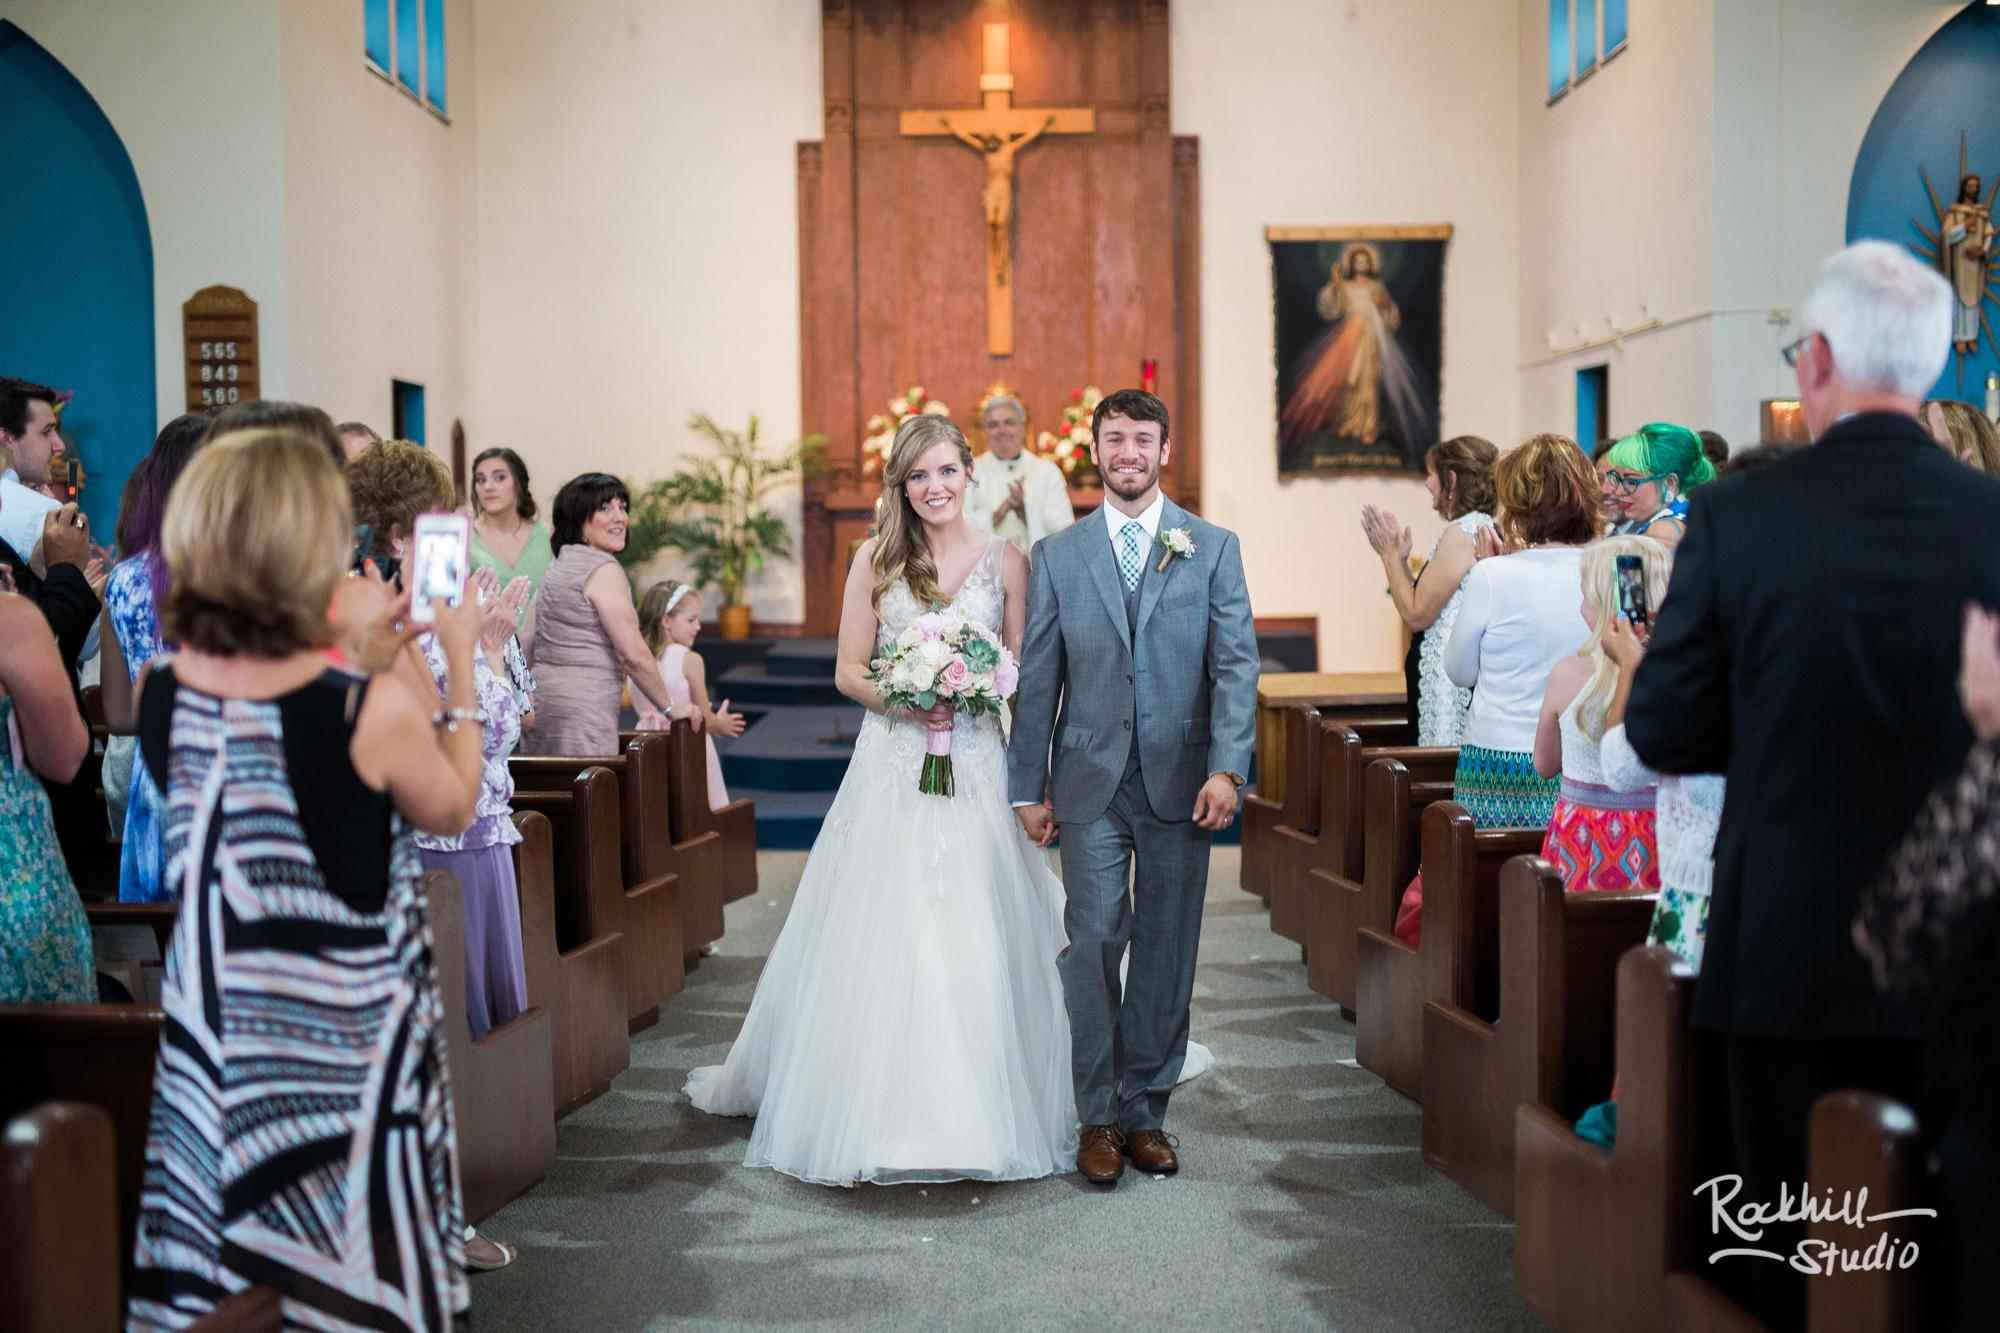 newberry-michigan-wedding-upper-peninsula-spring-photography-rockhill-ee-22.jpg